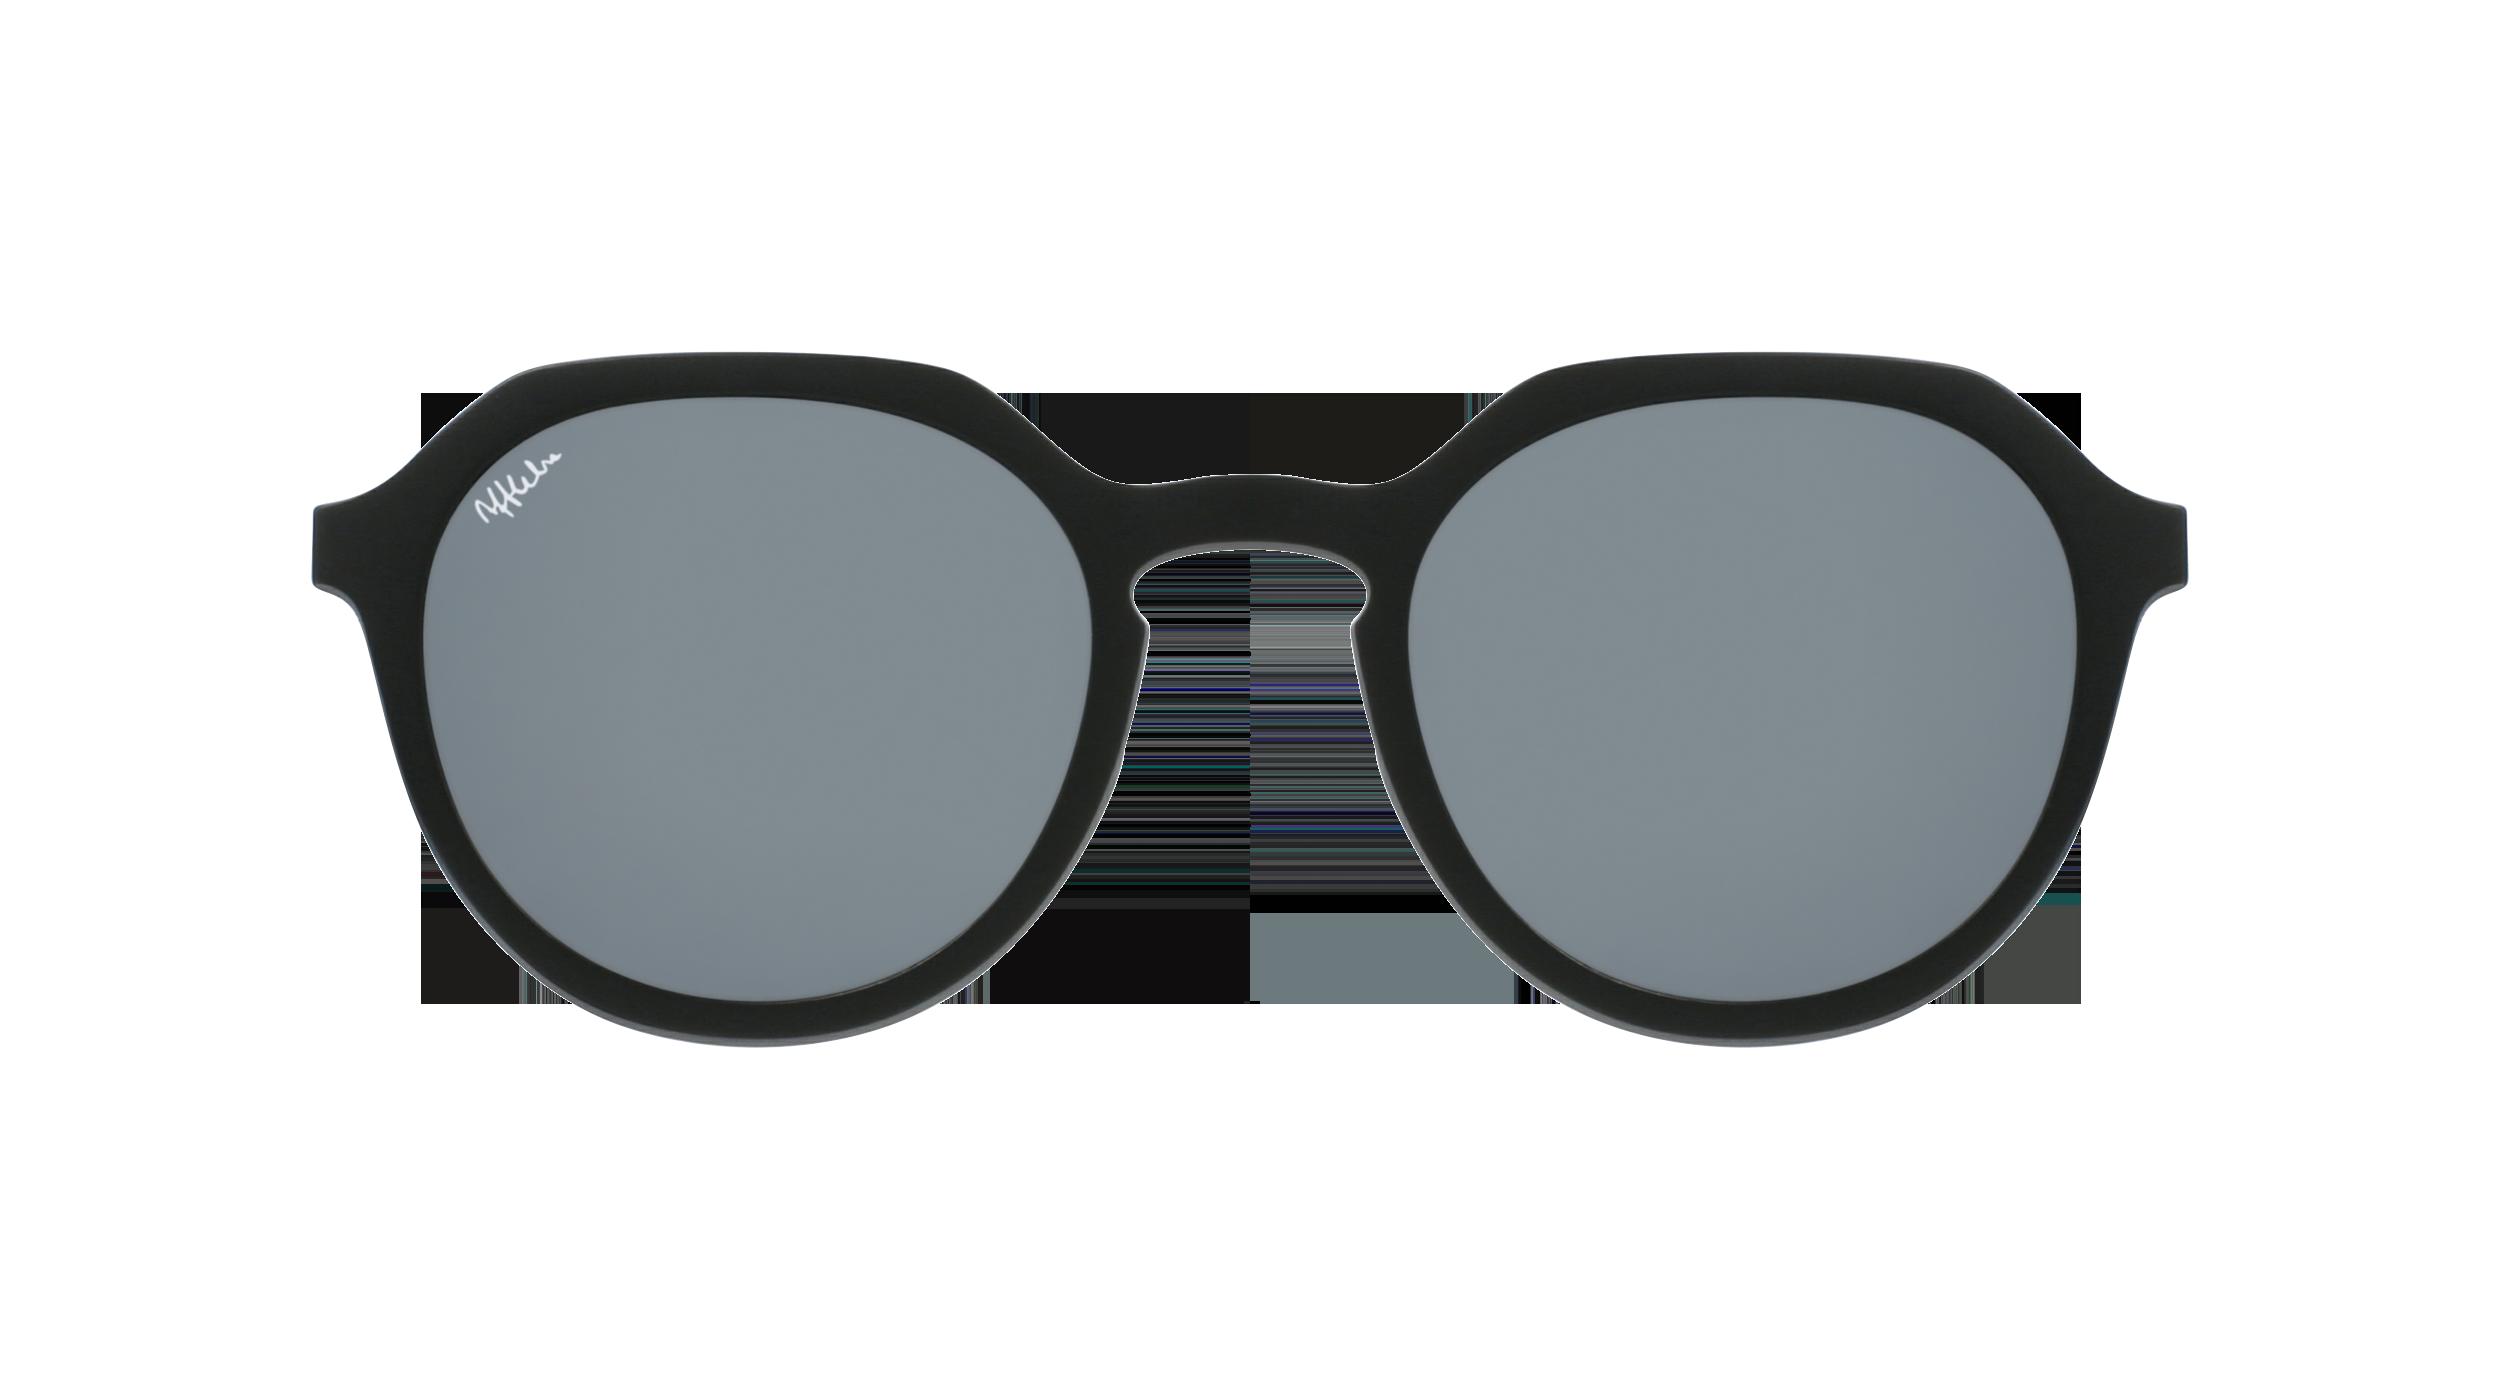 afflelou/france/products/smart_clip/clips_glasses/07630036458891.png